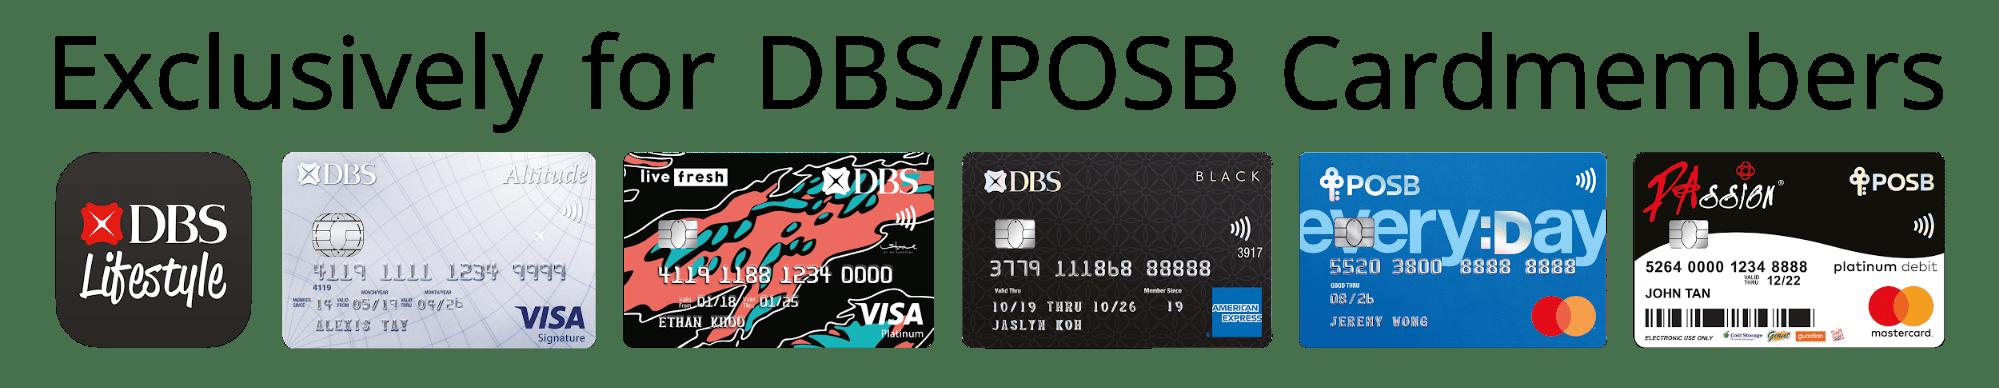 DBS POSB Cards Singapore